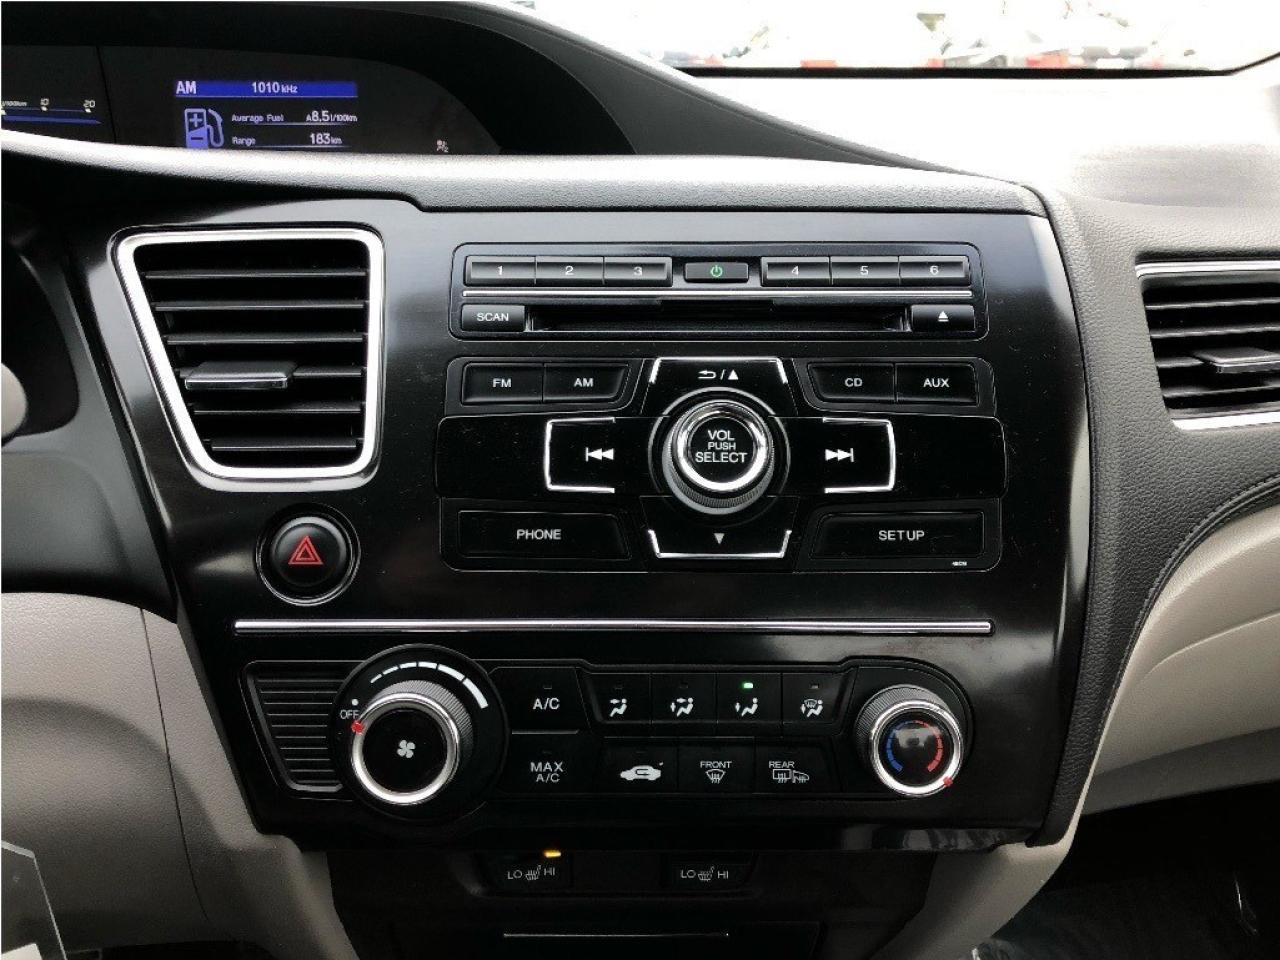 2013 Honda Civic LX    Heated Seats - Bluetooth